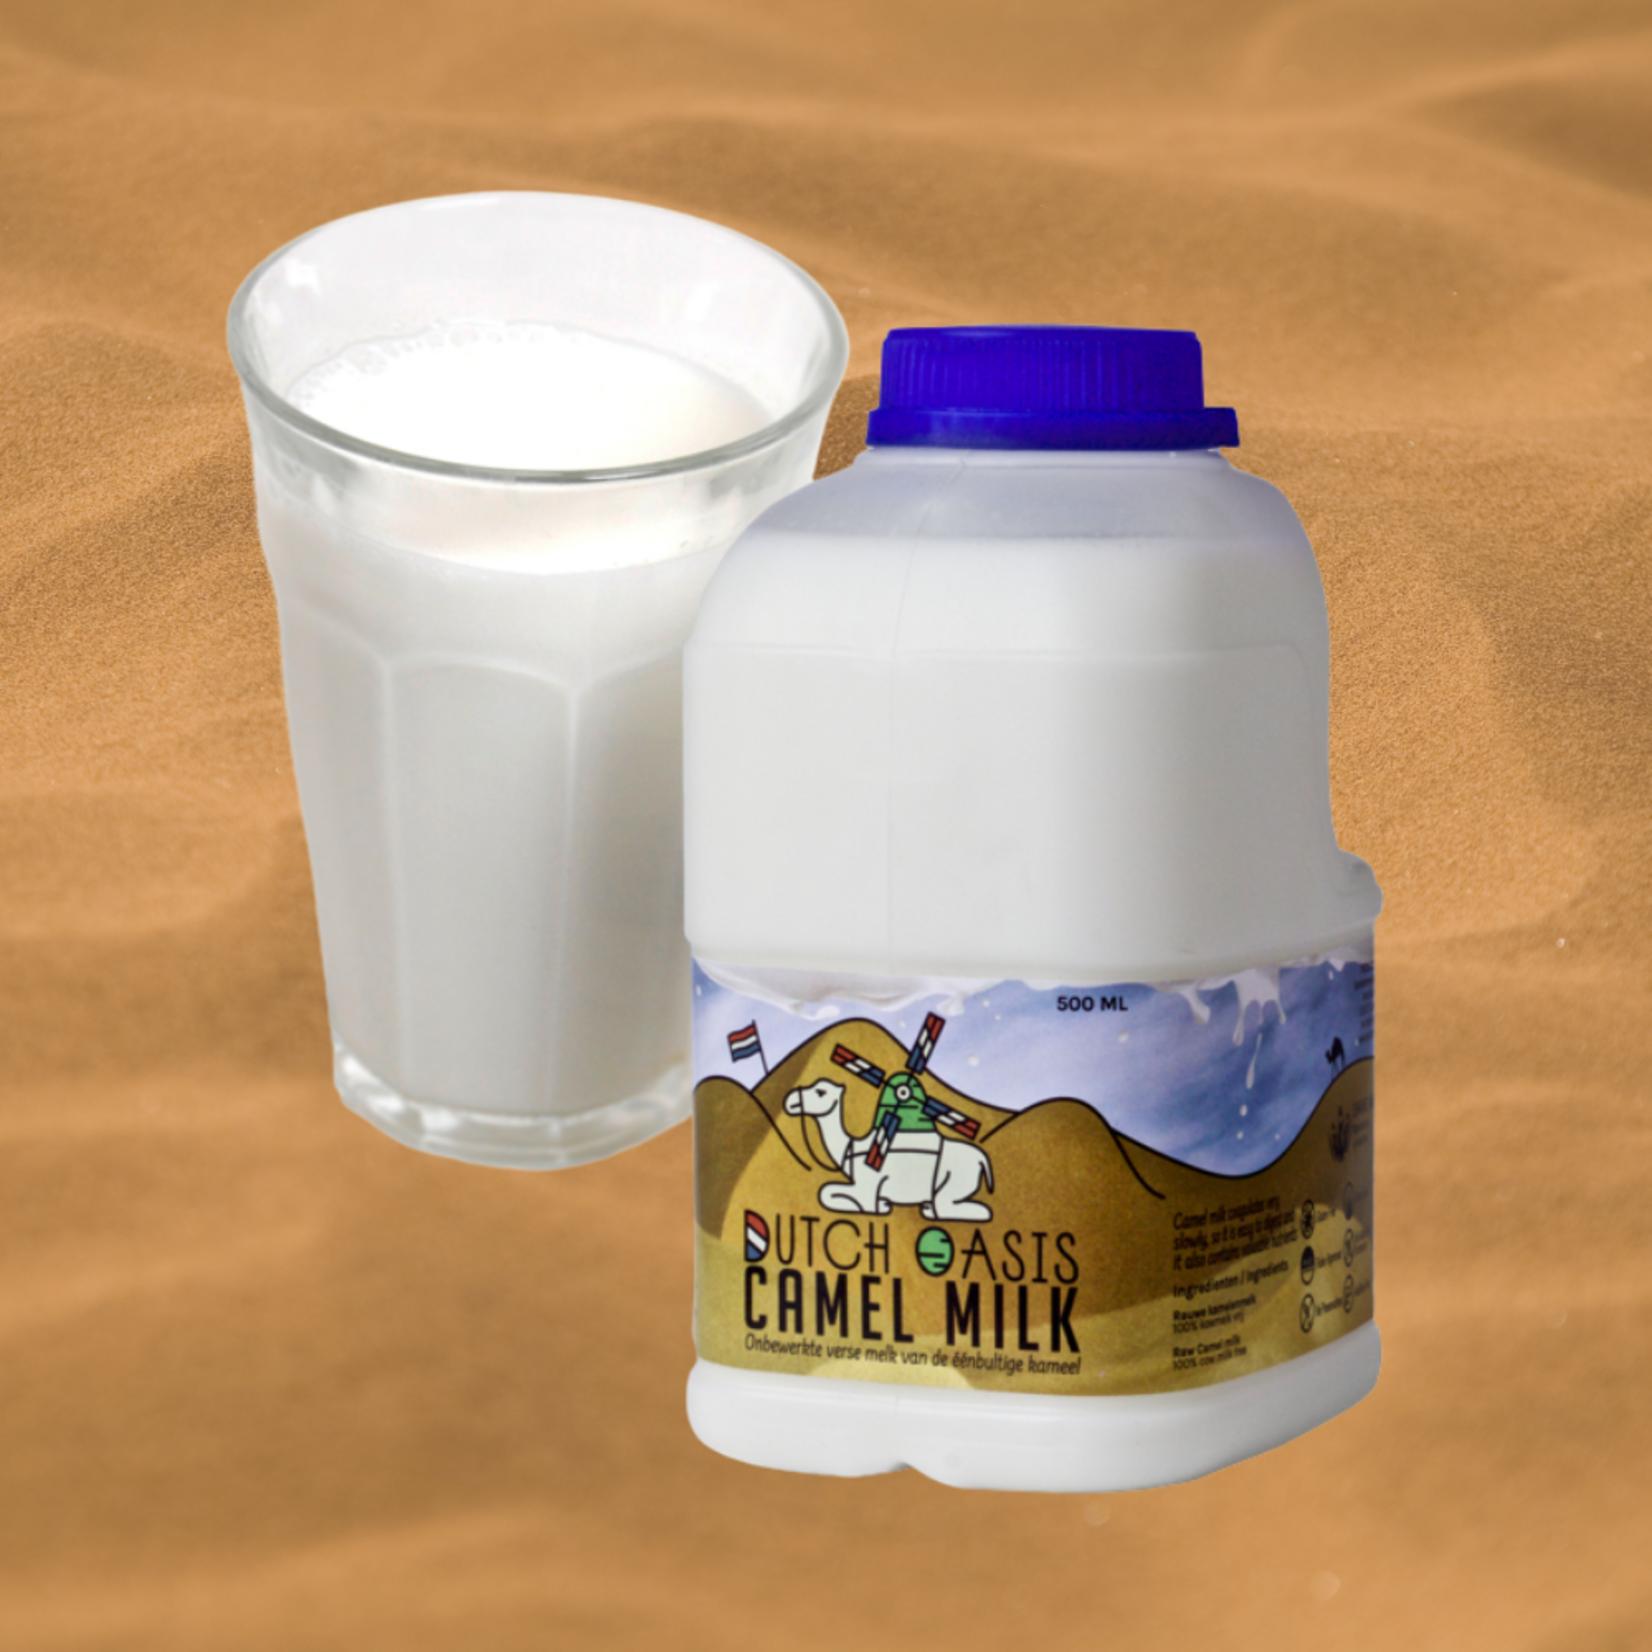 Dutch Oasis 28 bottles (á 500ml) frozen and raw camel milk